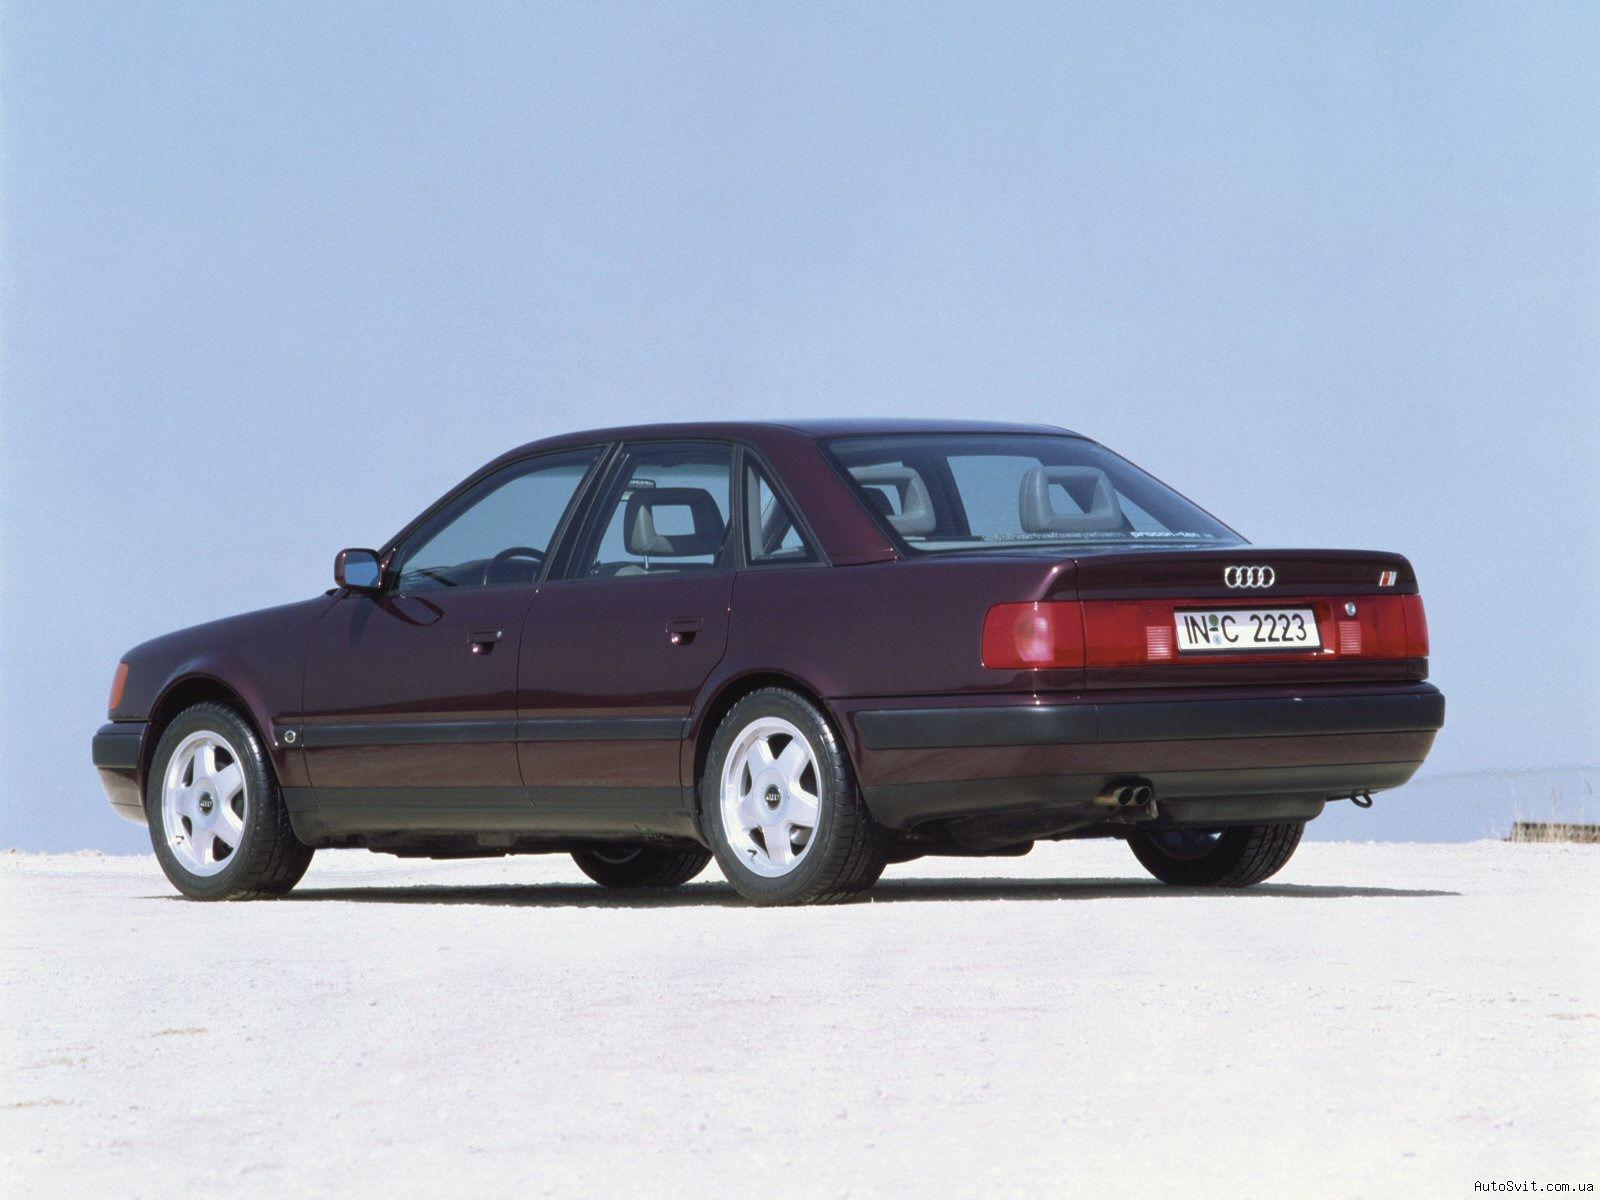 3dtuning Of Audi 100 Sedan 1991 3dtuning Com Unique On